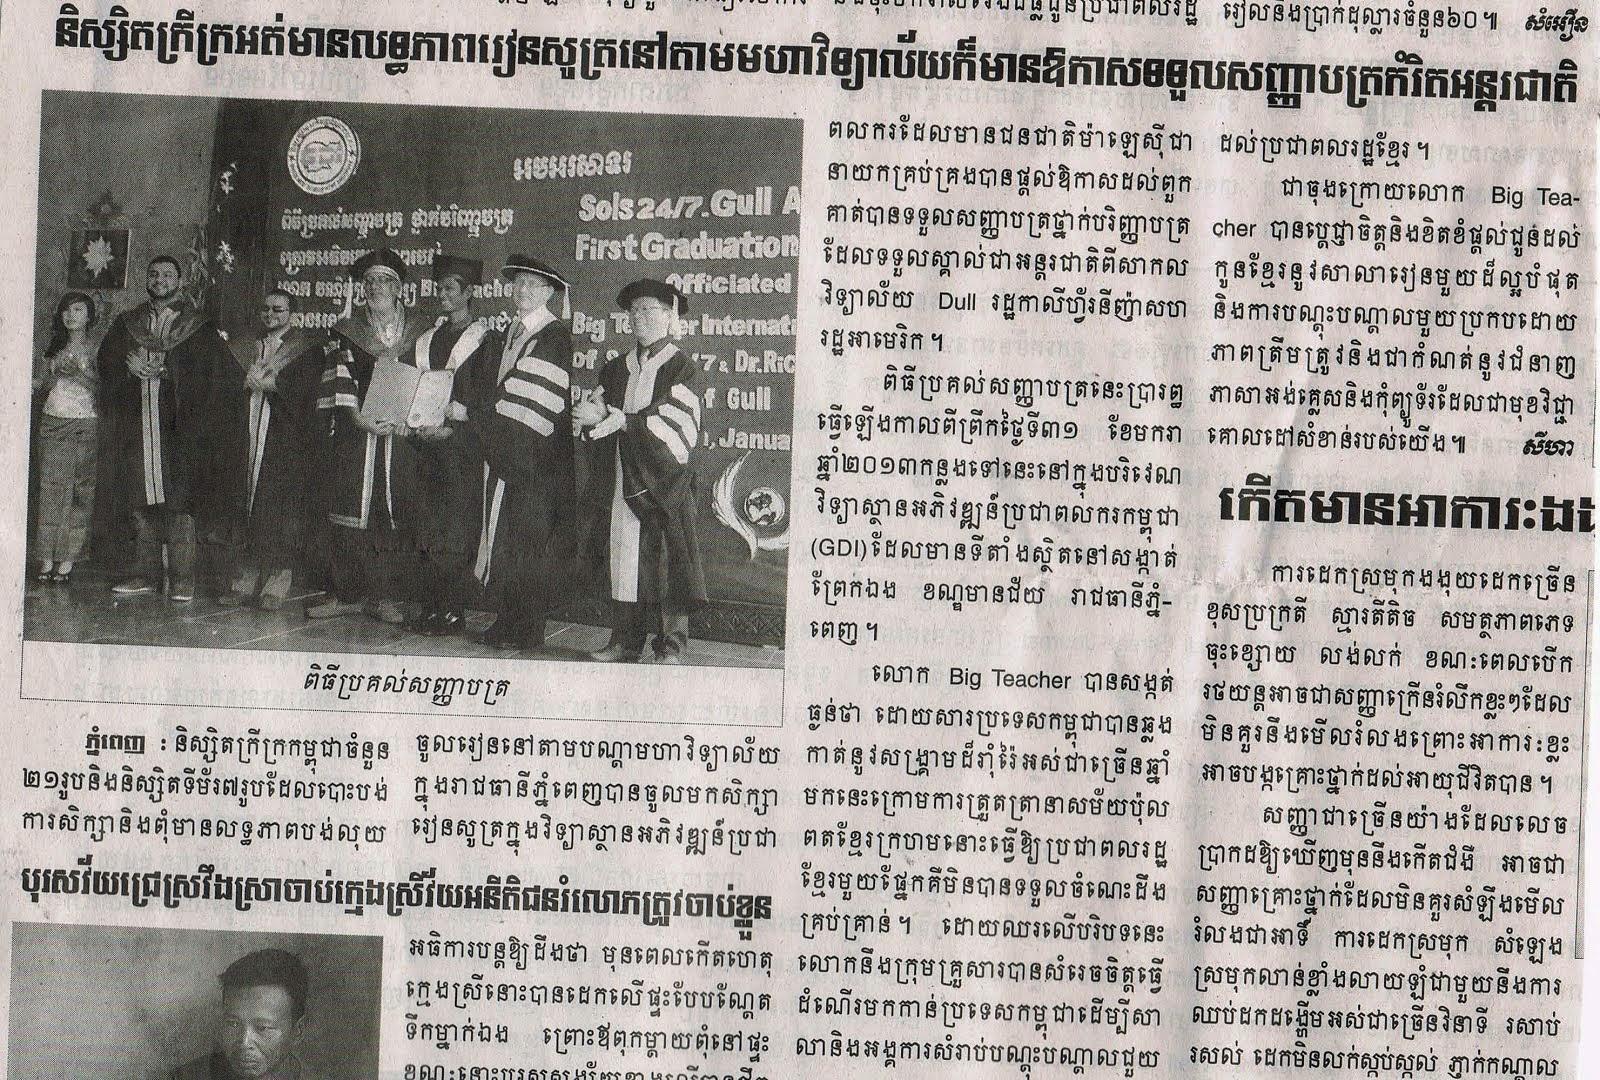 柬埔寨报章报道  Cambodia Press